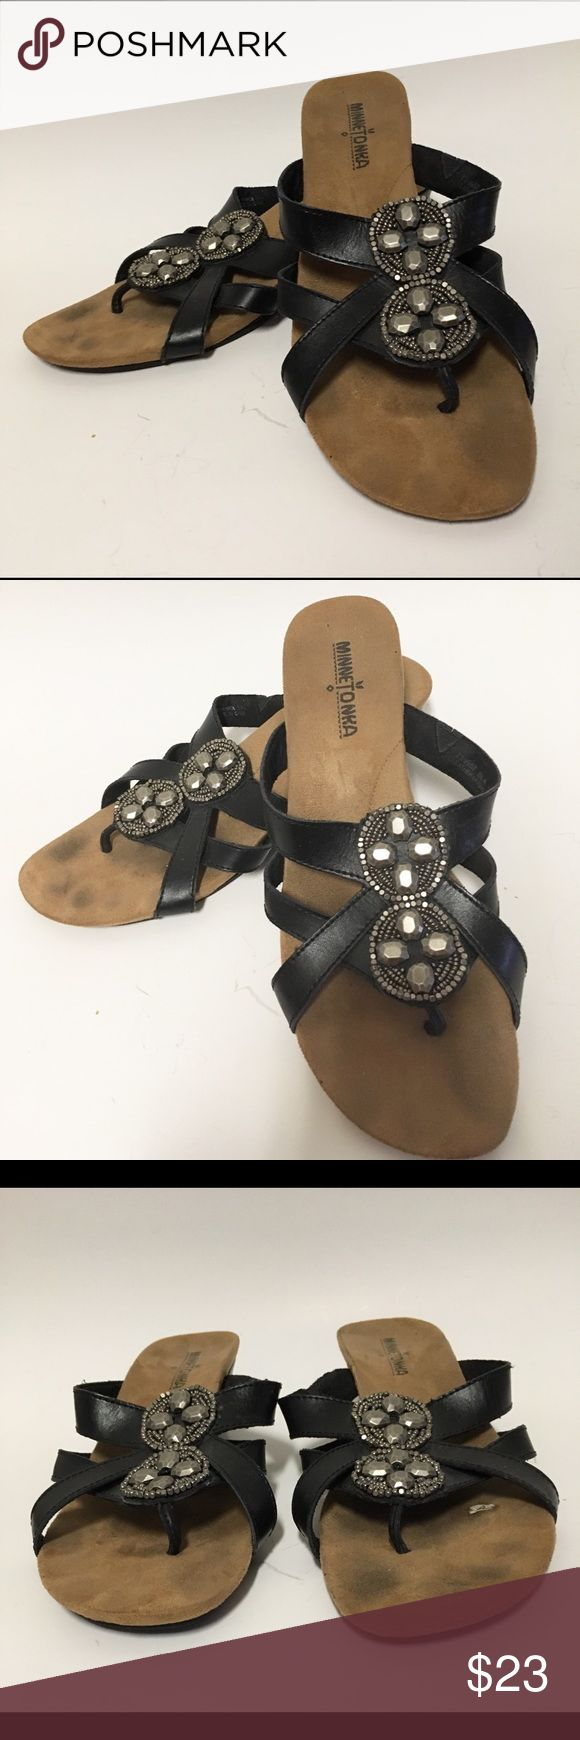 Minnetonka Wedge Sandals 9M Thongs Shoes Beaded Minnetonka Sandals Wedges Size 9M Minnetonka Shoes Sandals